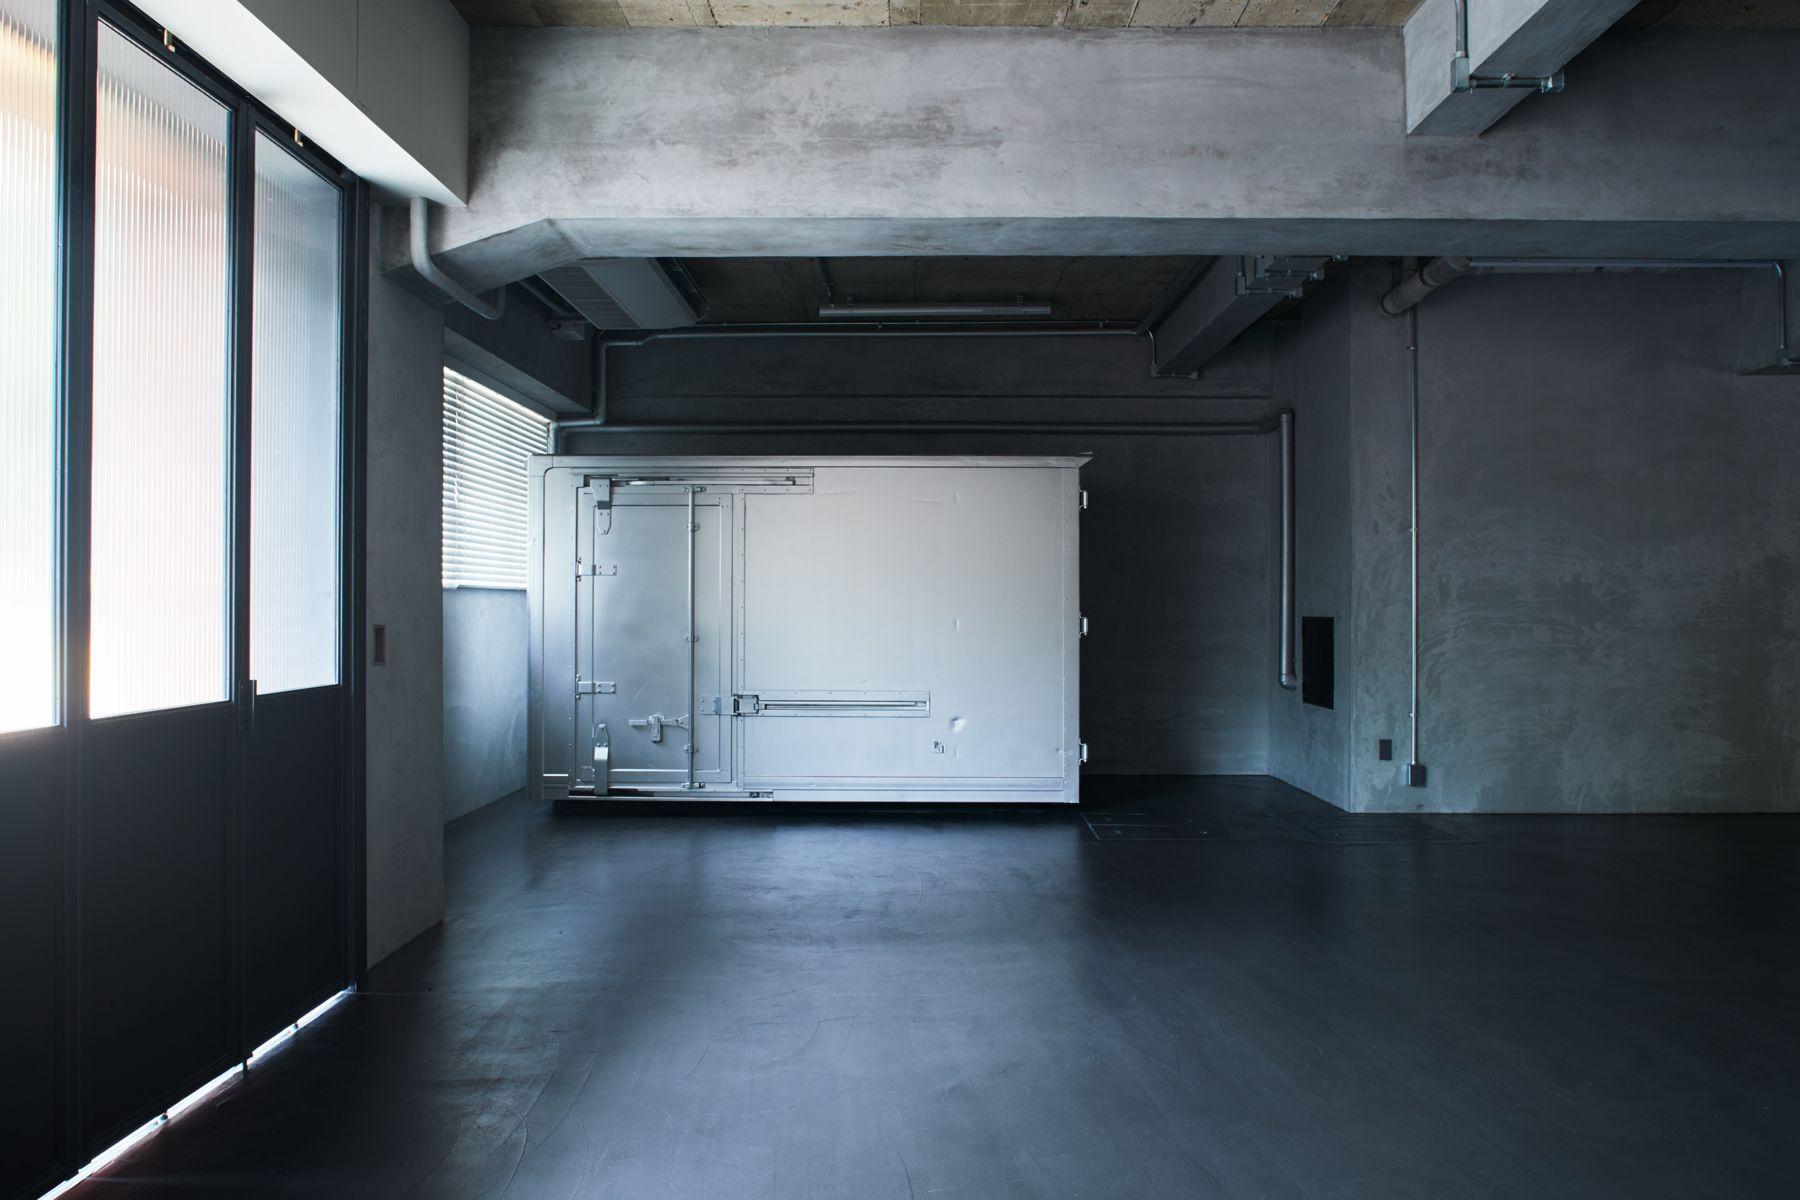 noru studio (ノル スタジオ)スタジオ内・コンテナボックス